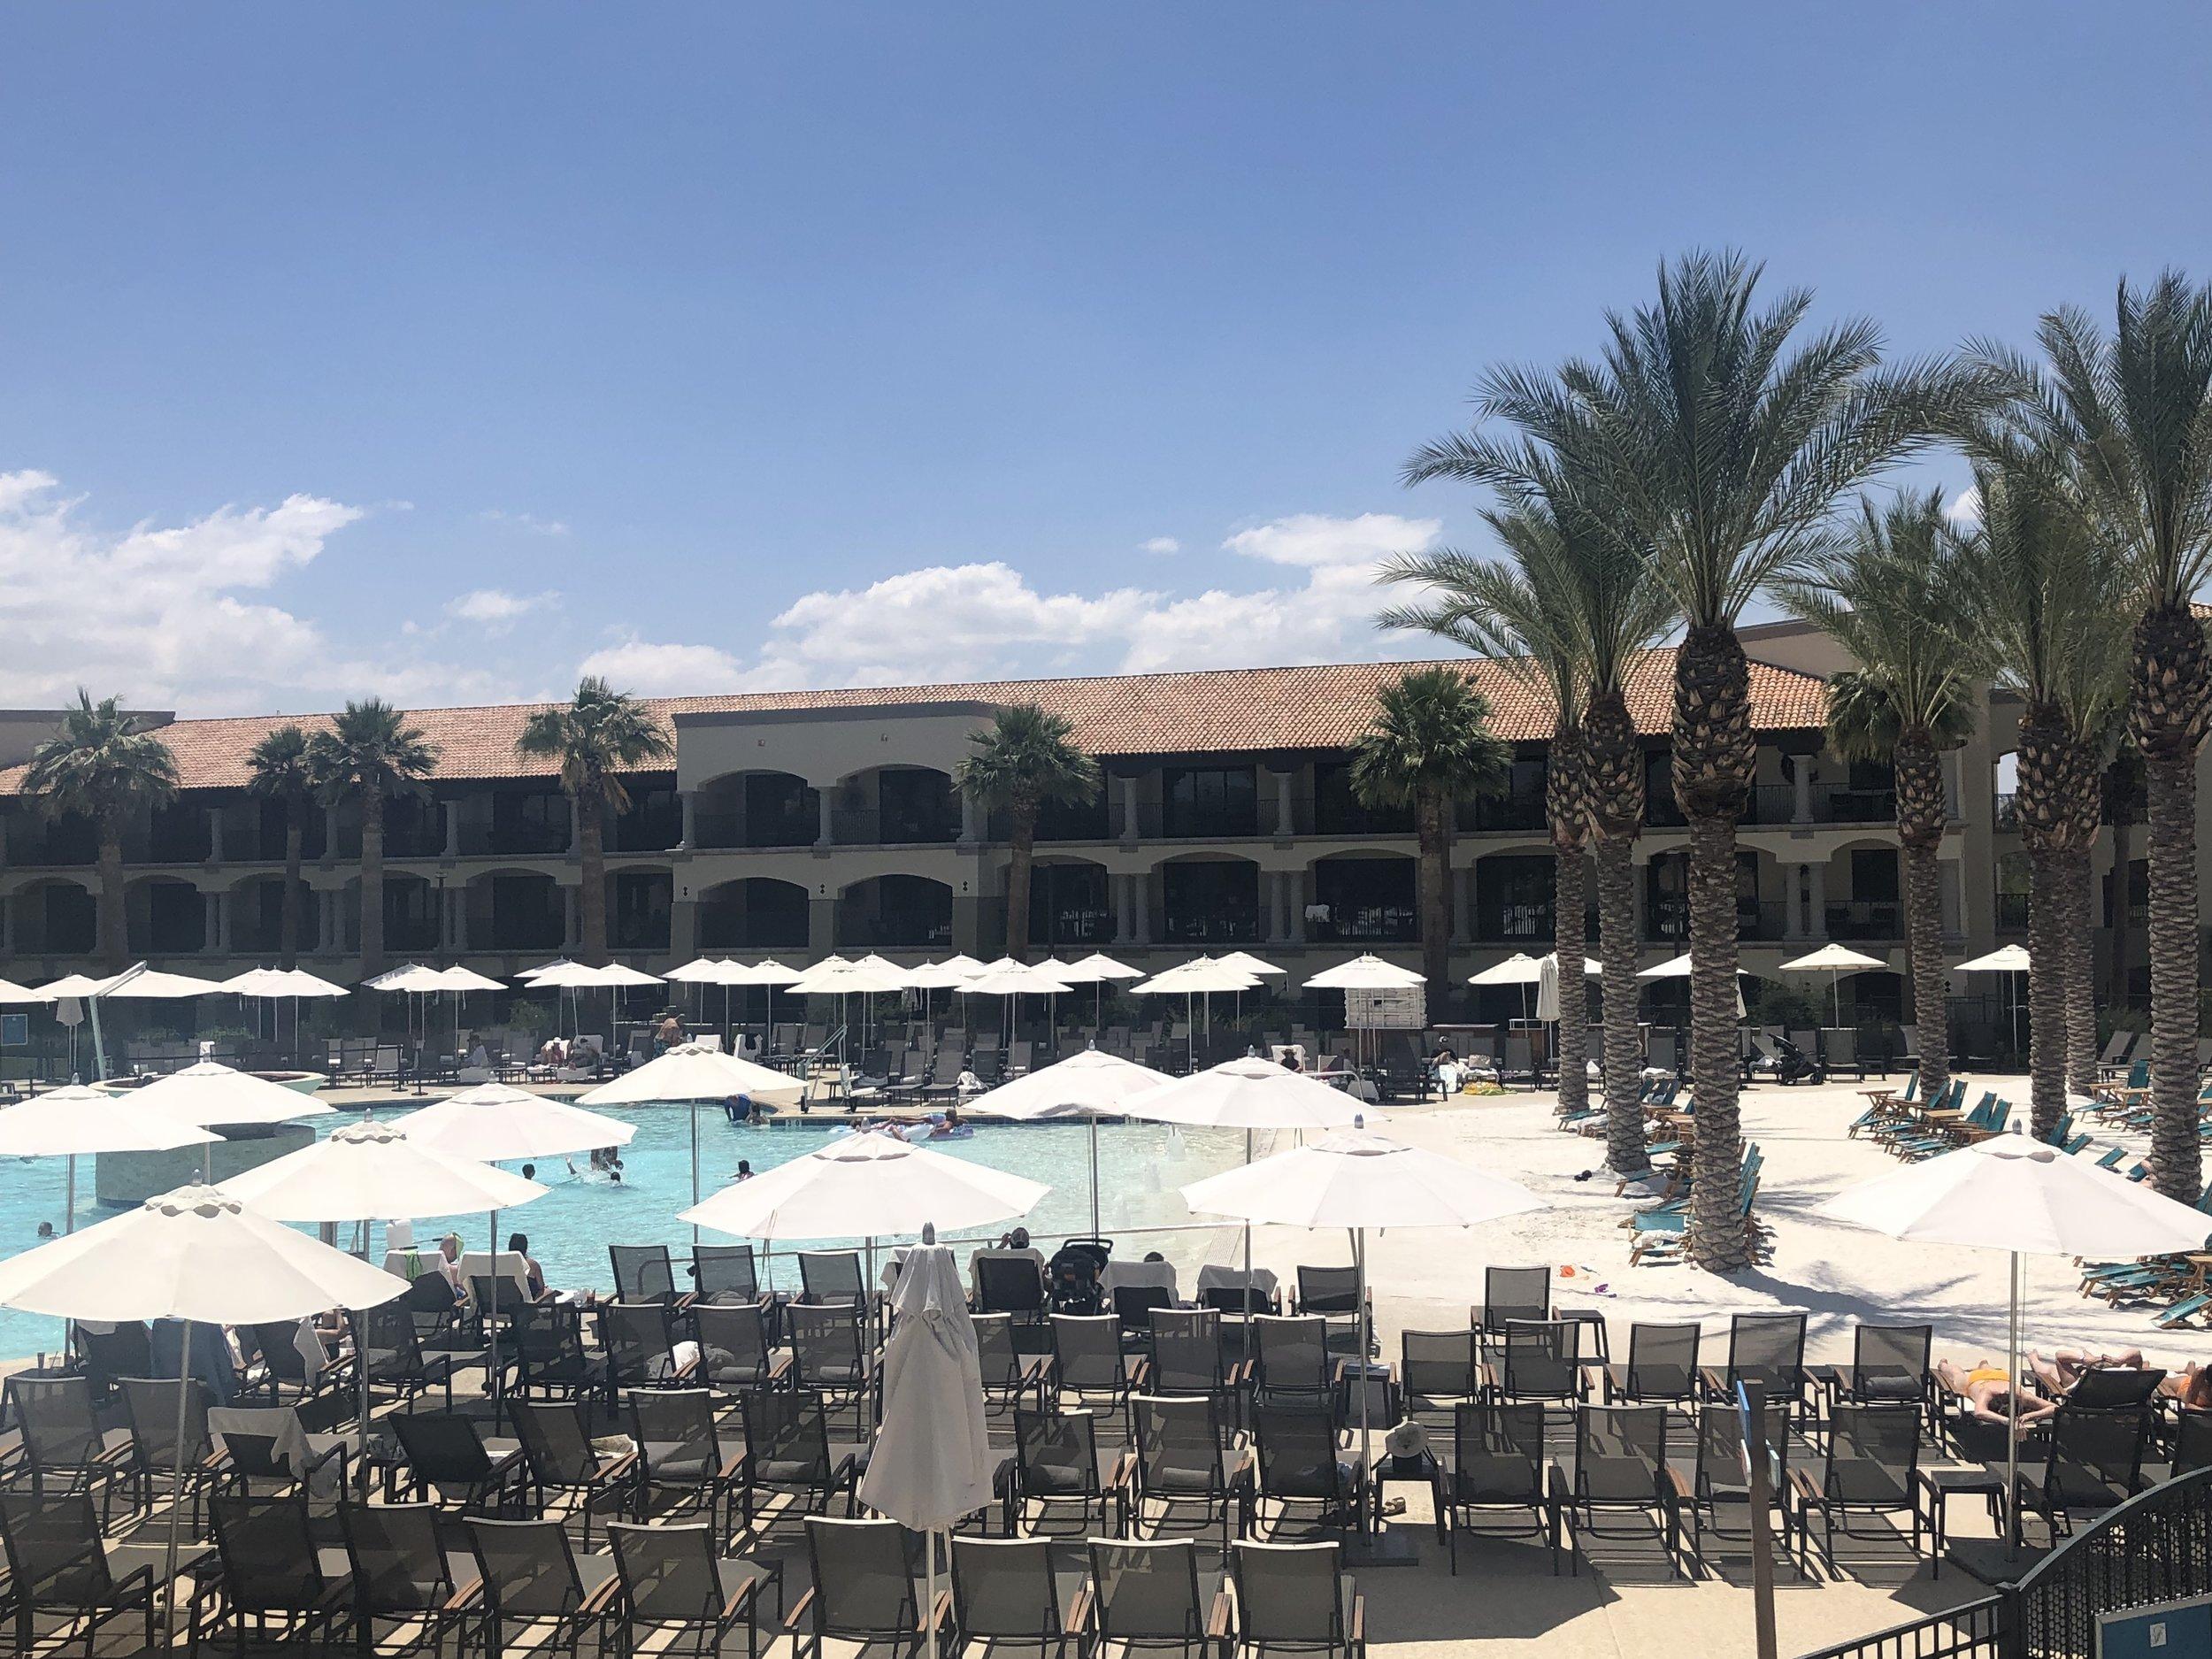 Wanderlust-travel-blog-Fairmont-Princess-Scottsdale-Arizona-pool